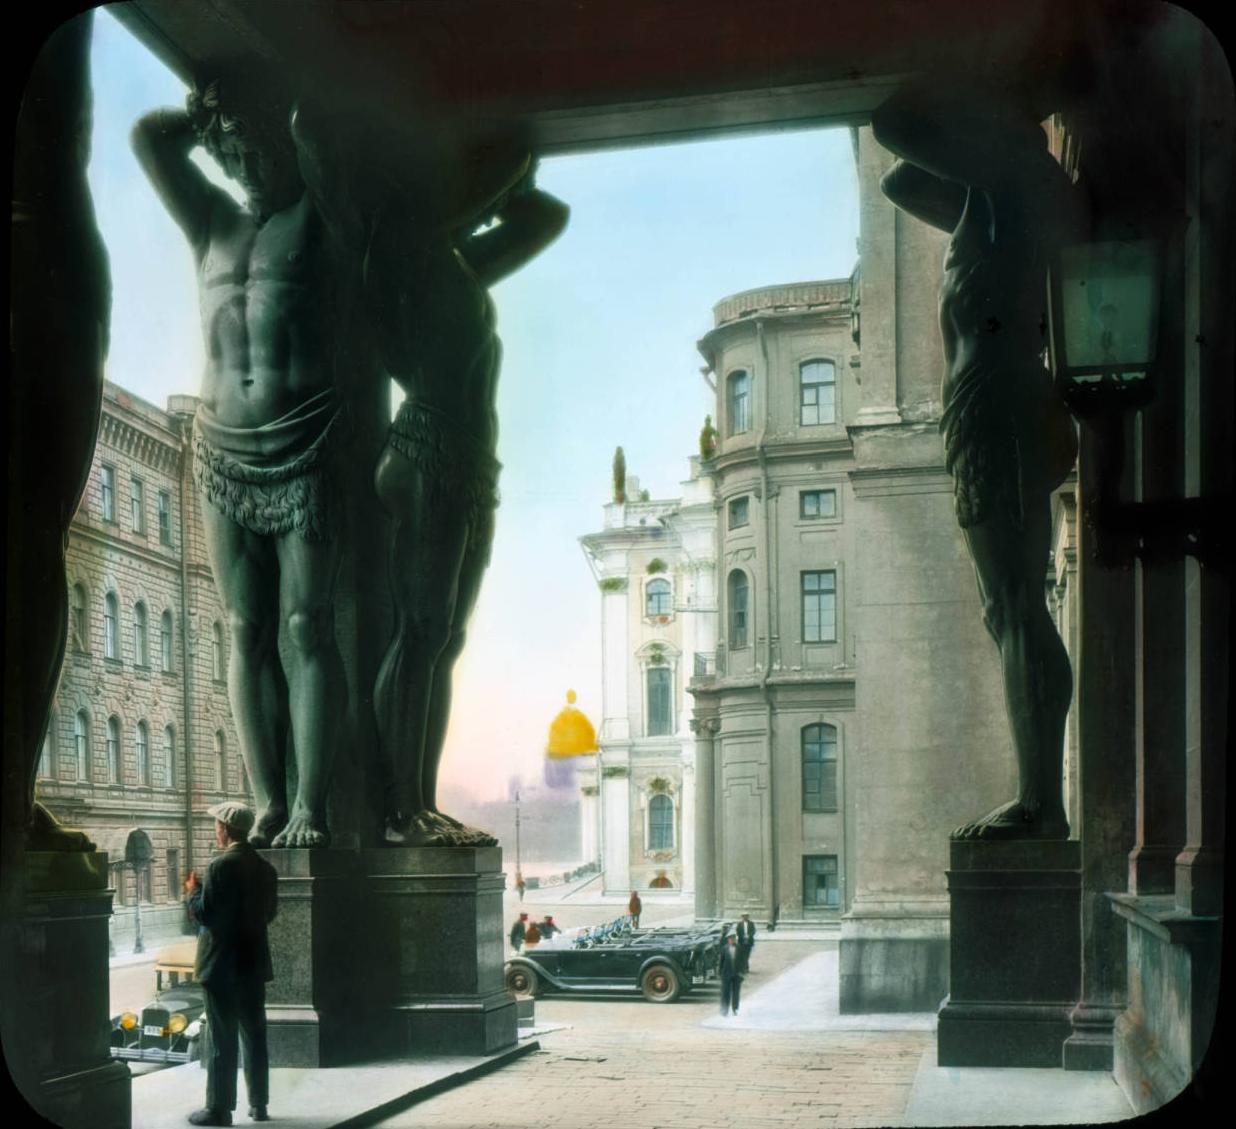 Санкт-Петербург. Эрмитаж (Новый Эрмитаж), портик с атлантами